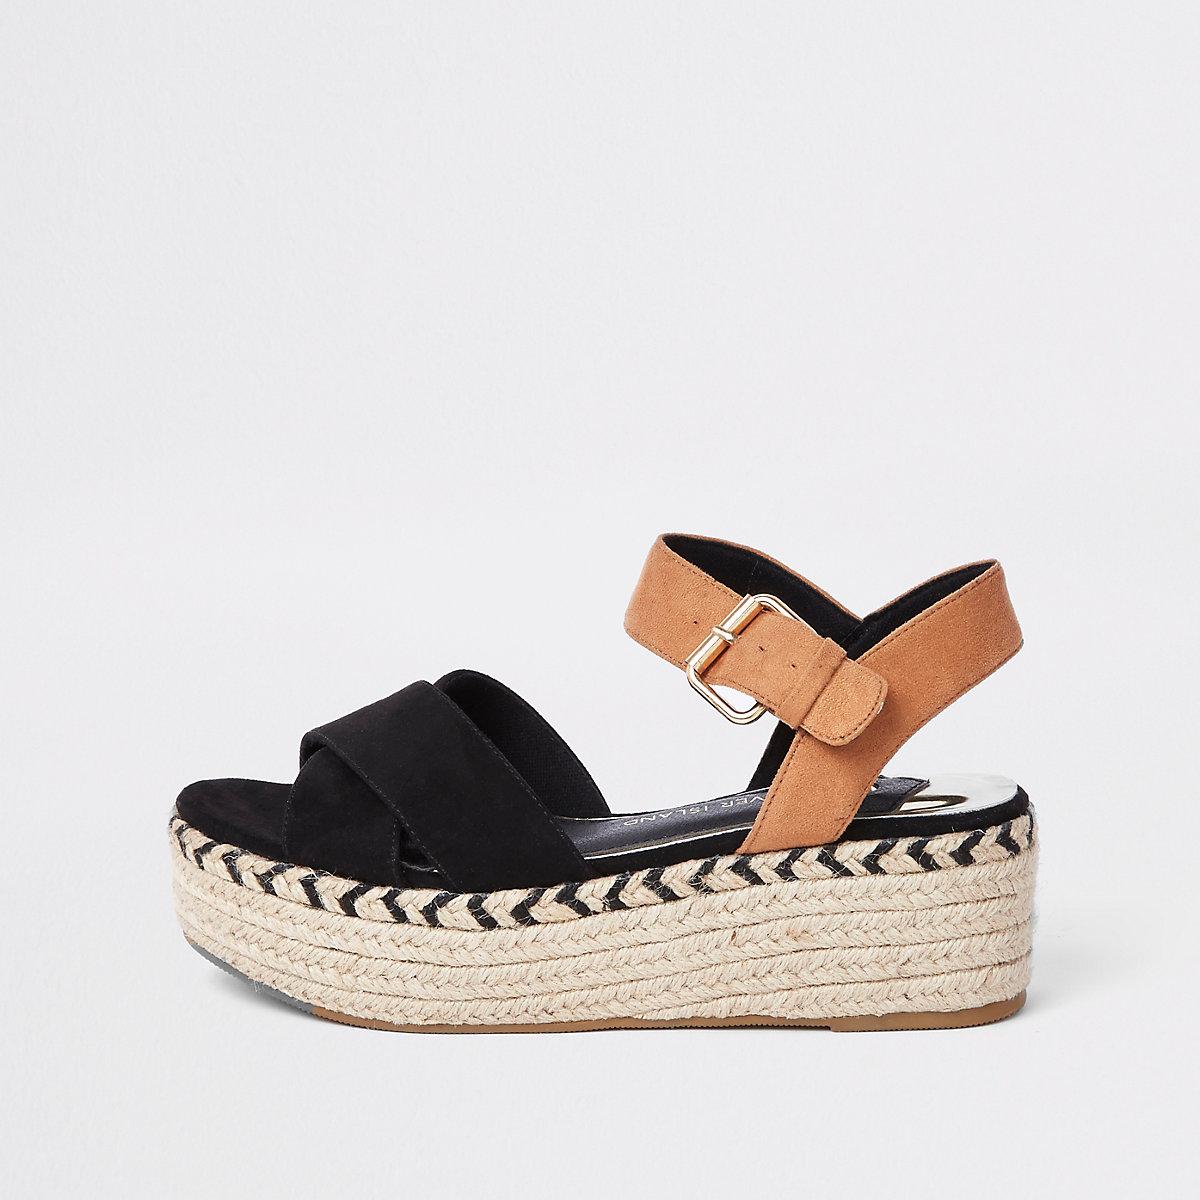 ab0ac563fe65a Black contrast espadrille wedge sandals - Sandals - Shoes   Boots - women